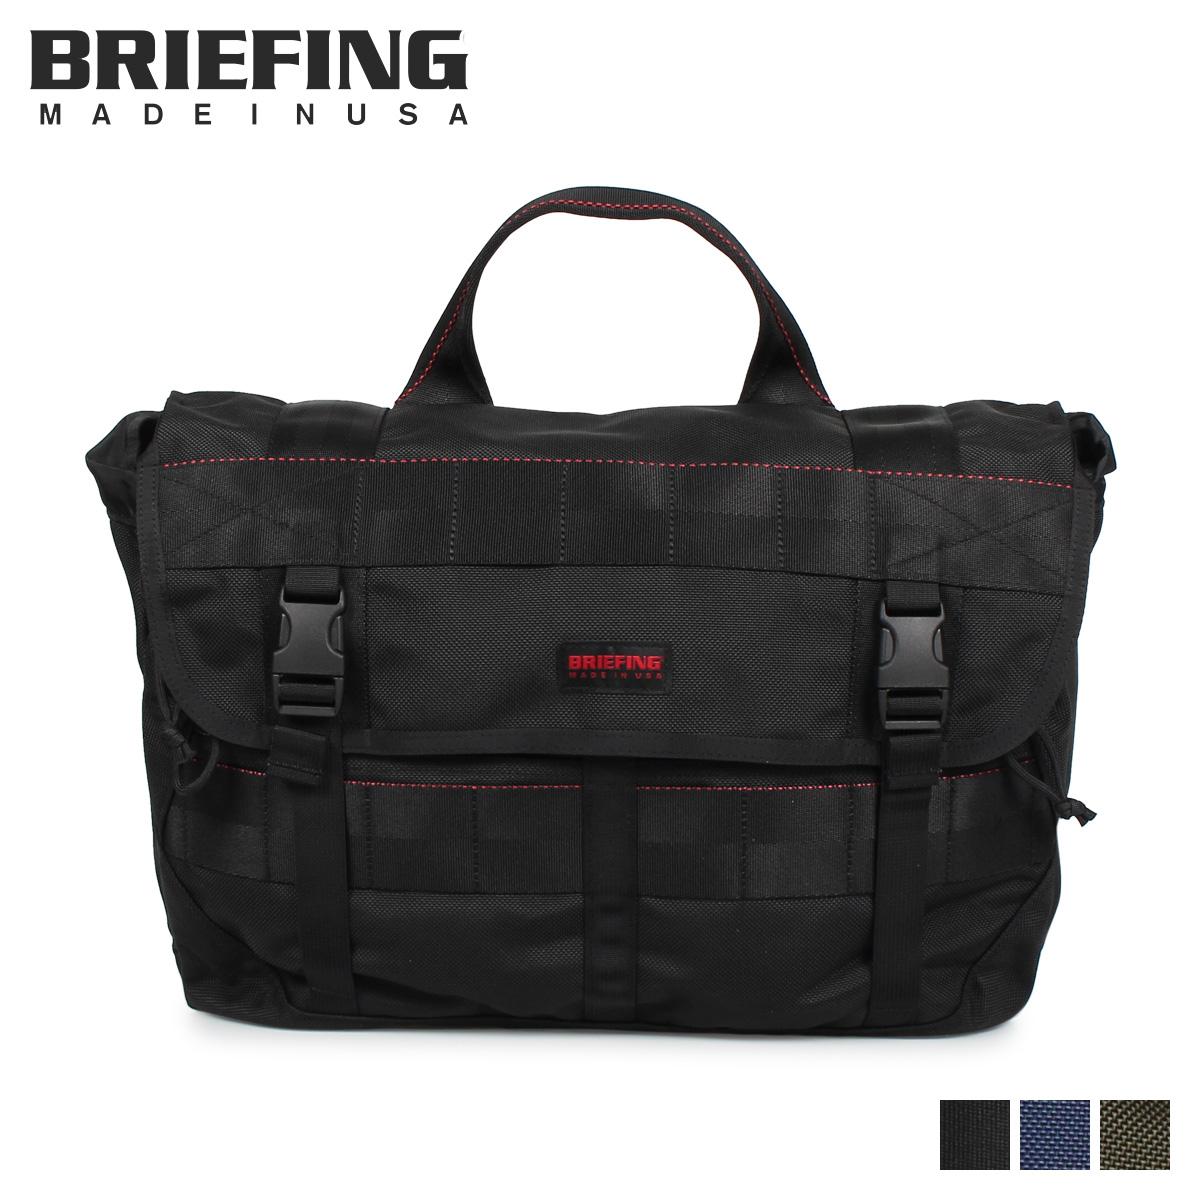 BRIEFING ブリーフィング グラスホッパー バッグ ショルダーバッグ メッセンジャーバッグ メンズ GRASSHOPPER SHOULDER BAG ブラック 黒 ネイビー カーキ 402219